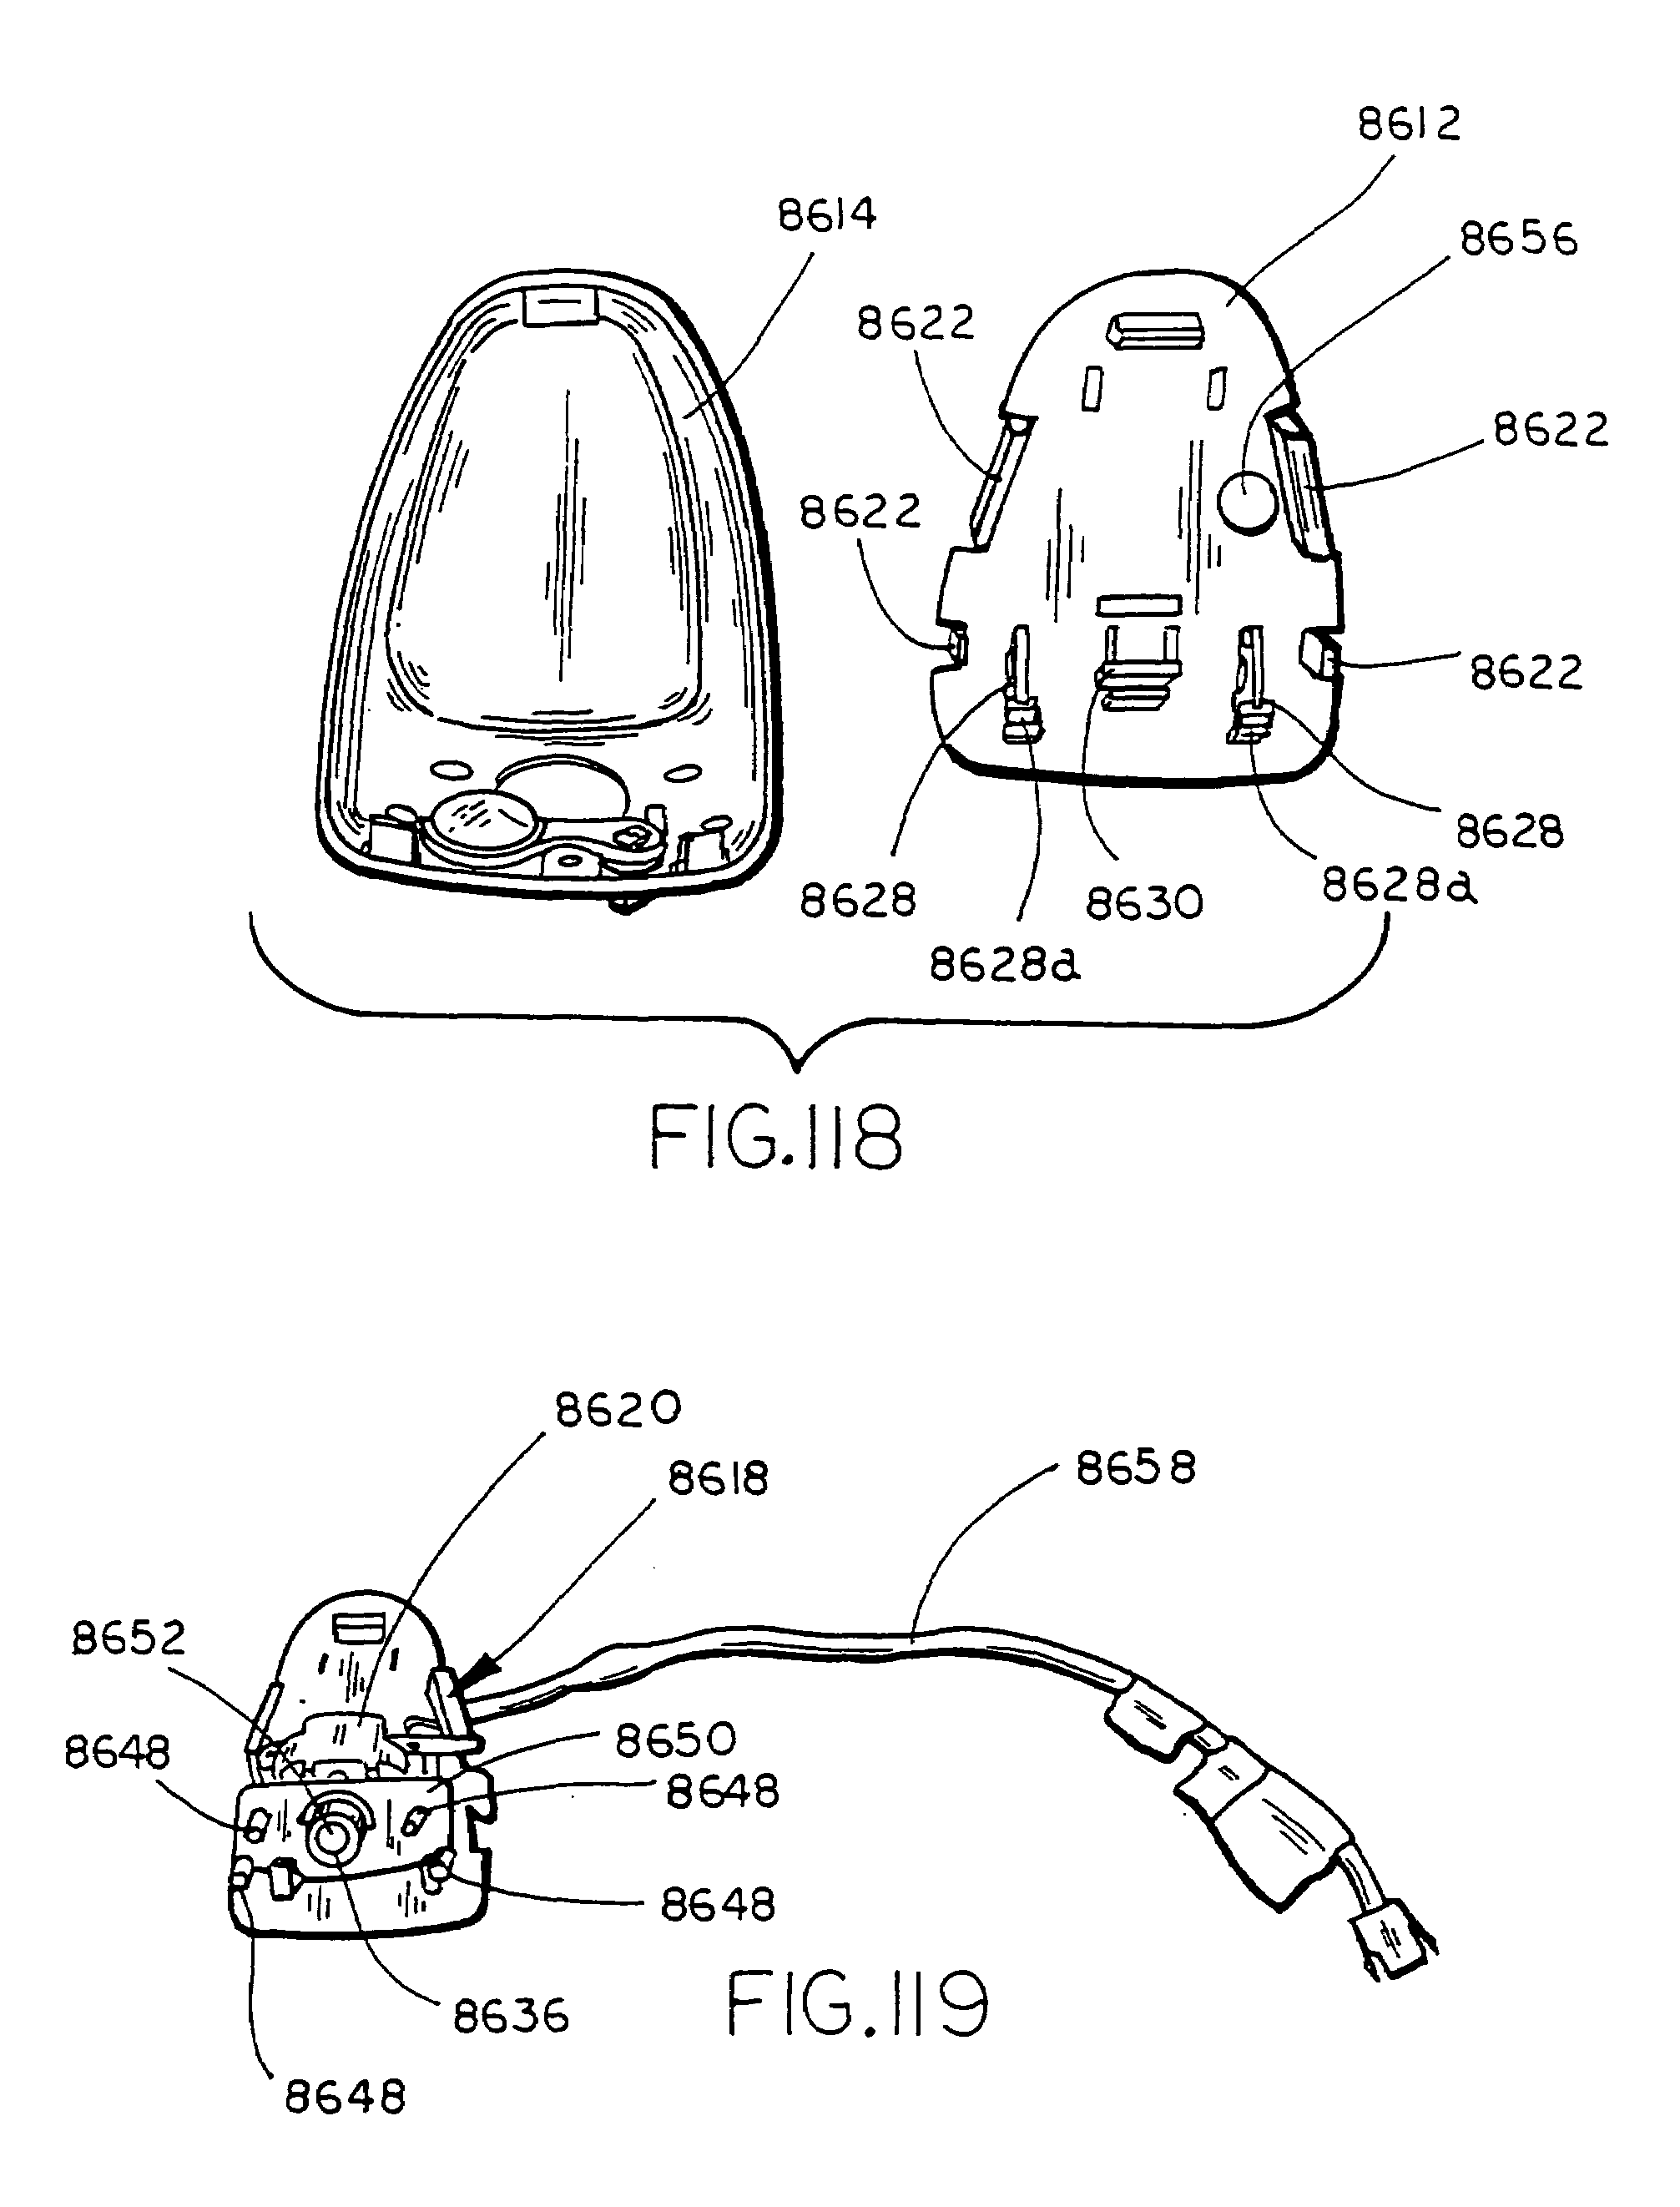 Patent US 7,446,650 B2